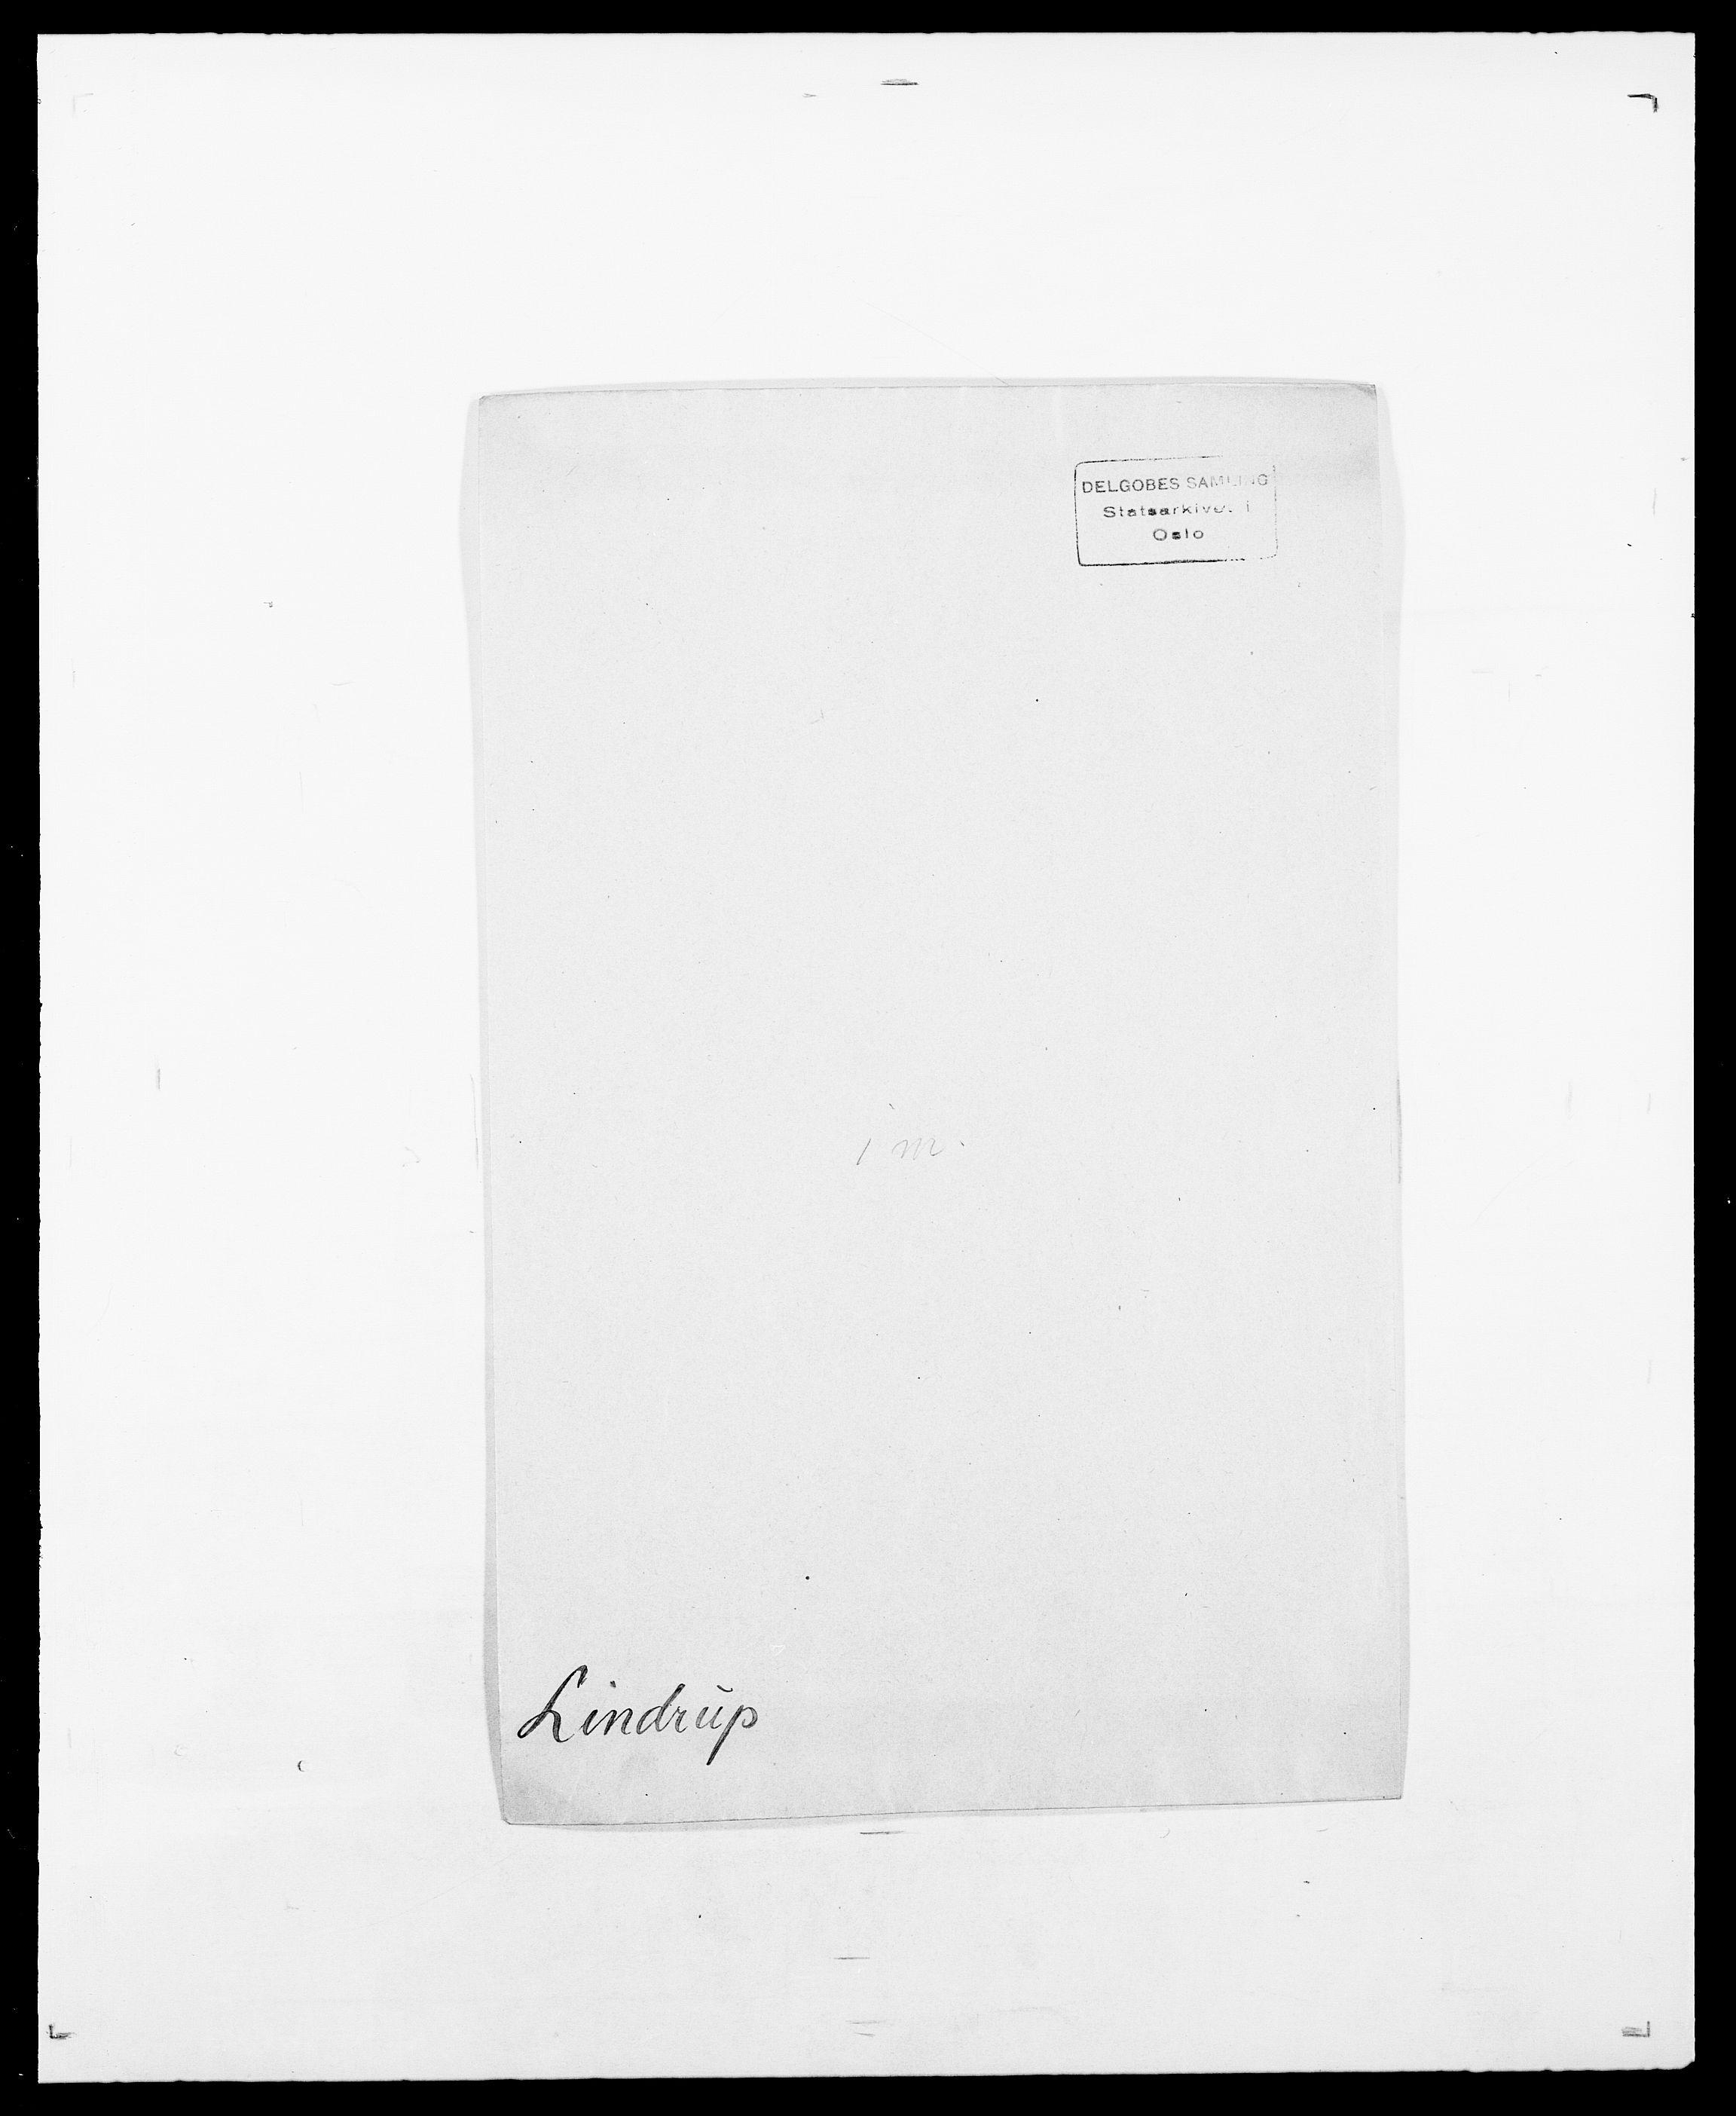 SAO, Delgobe, Charles Antoine - samling, D/Da/L0023: Lau - Lirvyn, s. 617